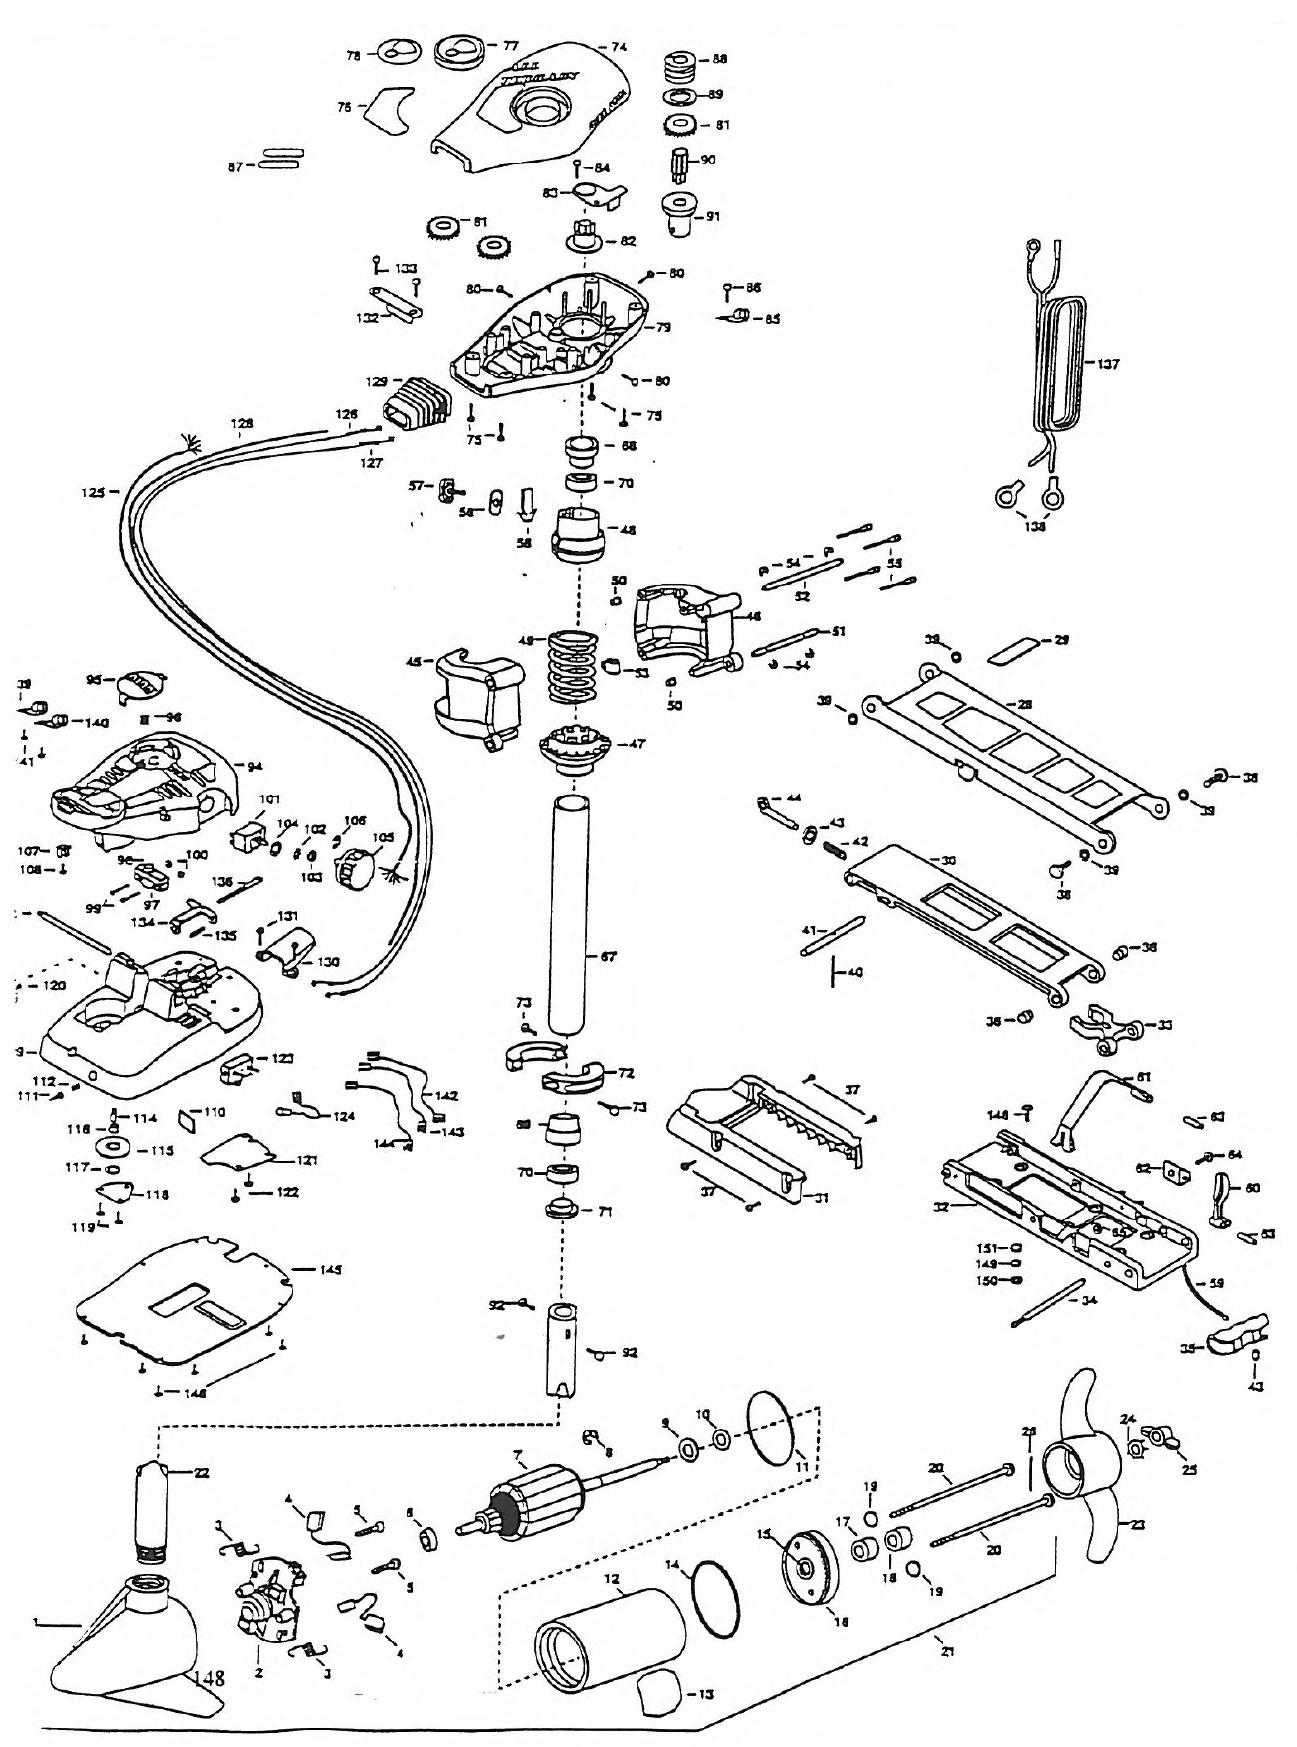 Trolling Motor Wiring Diagrams For 24v 36v Systems